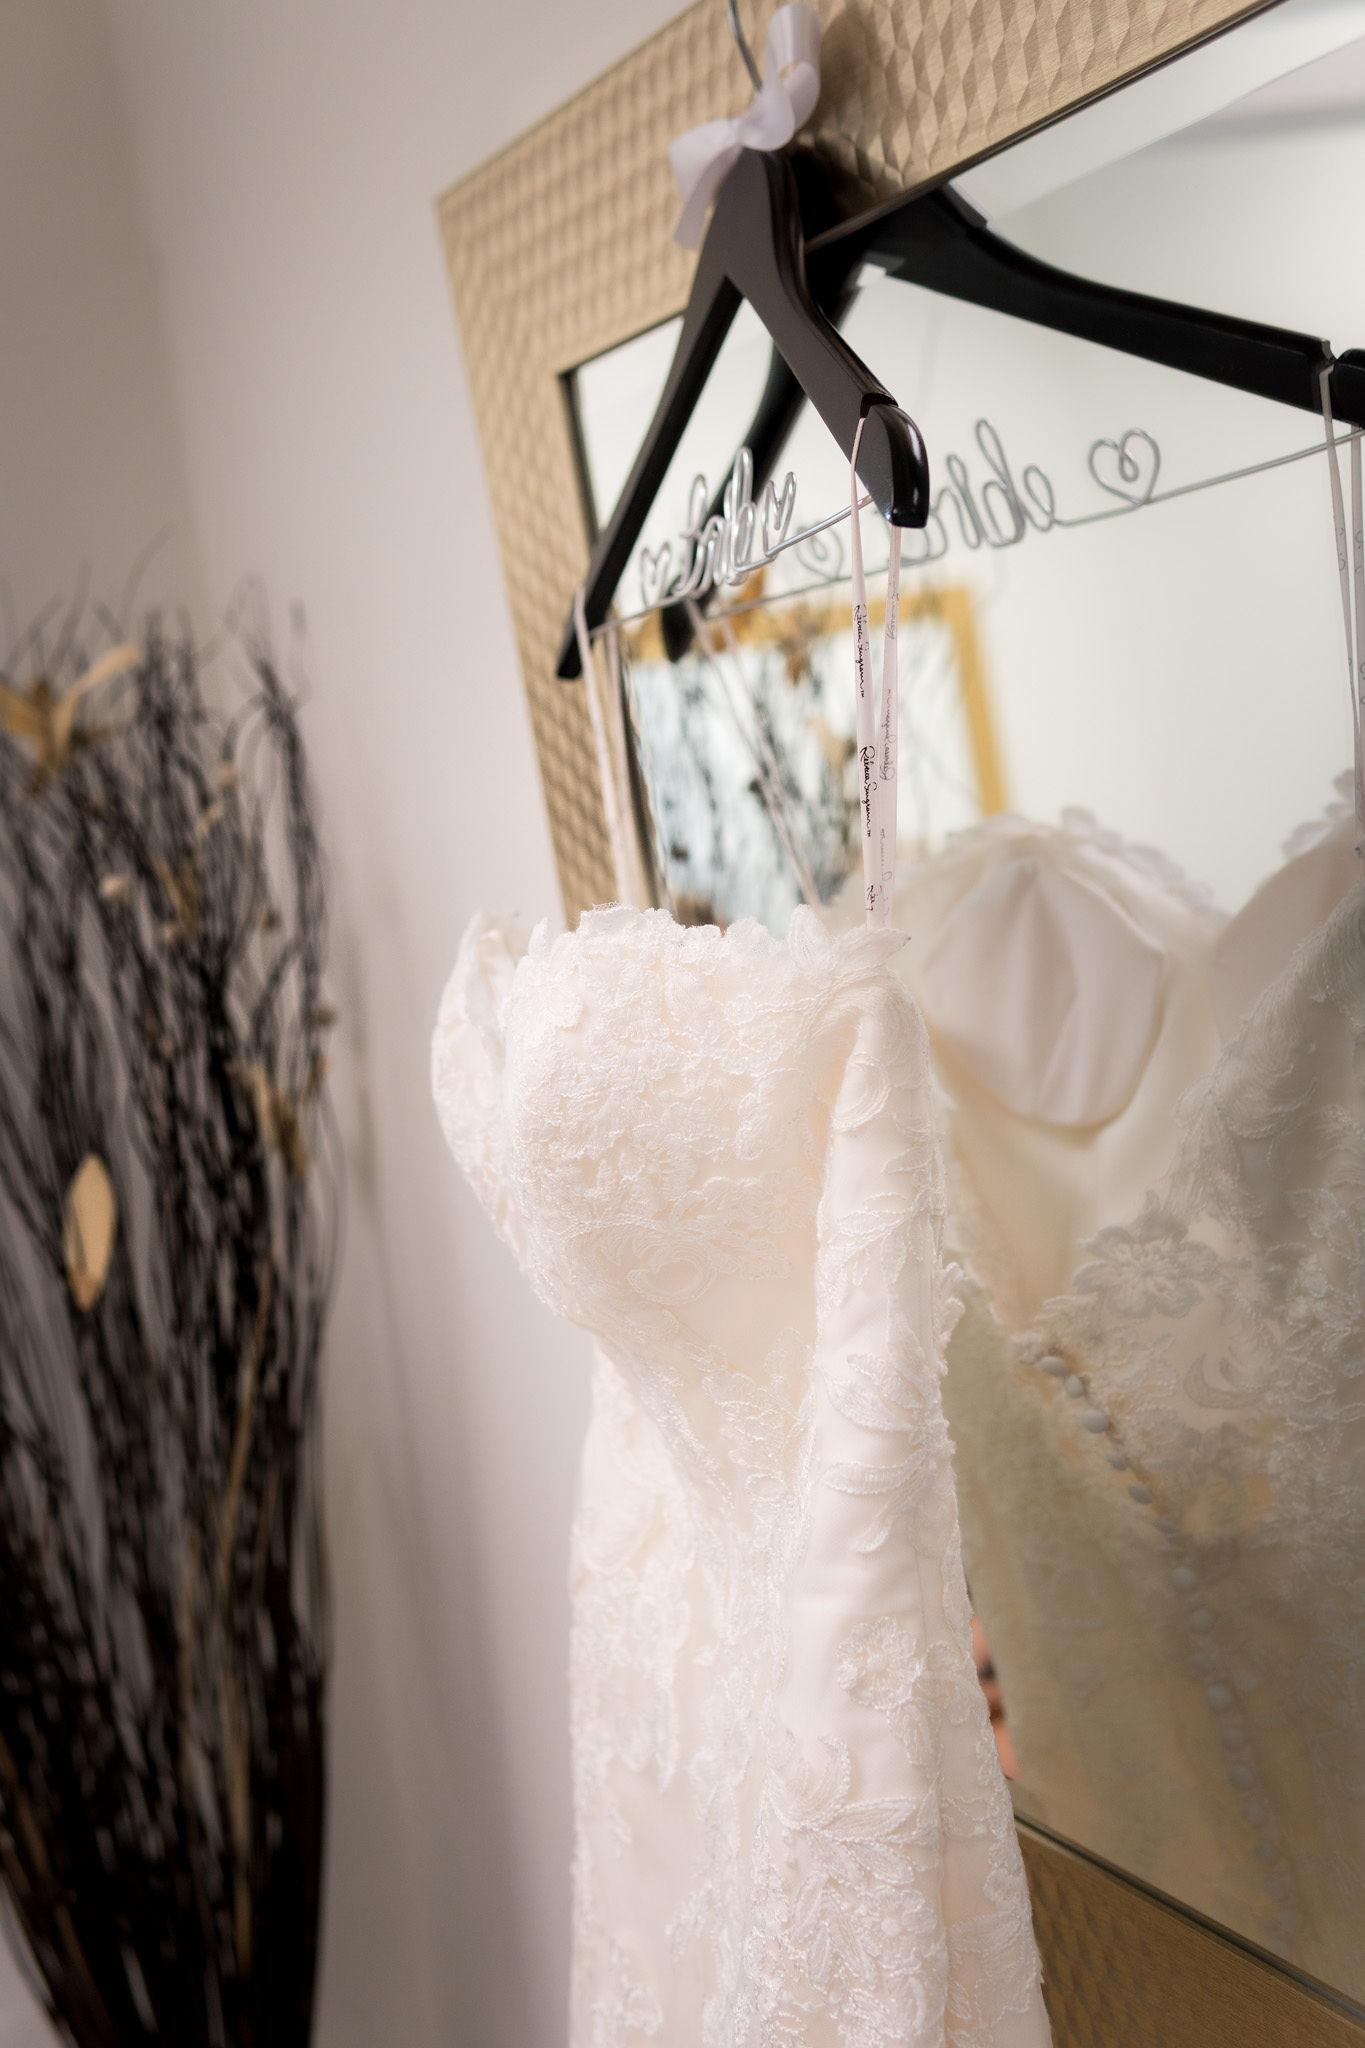 Amber's Bridal Portrait Session | Chicago Wedding Photographer-05.jpg